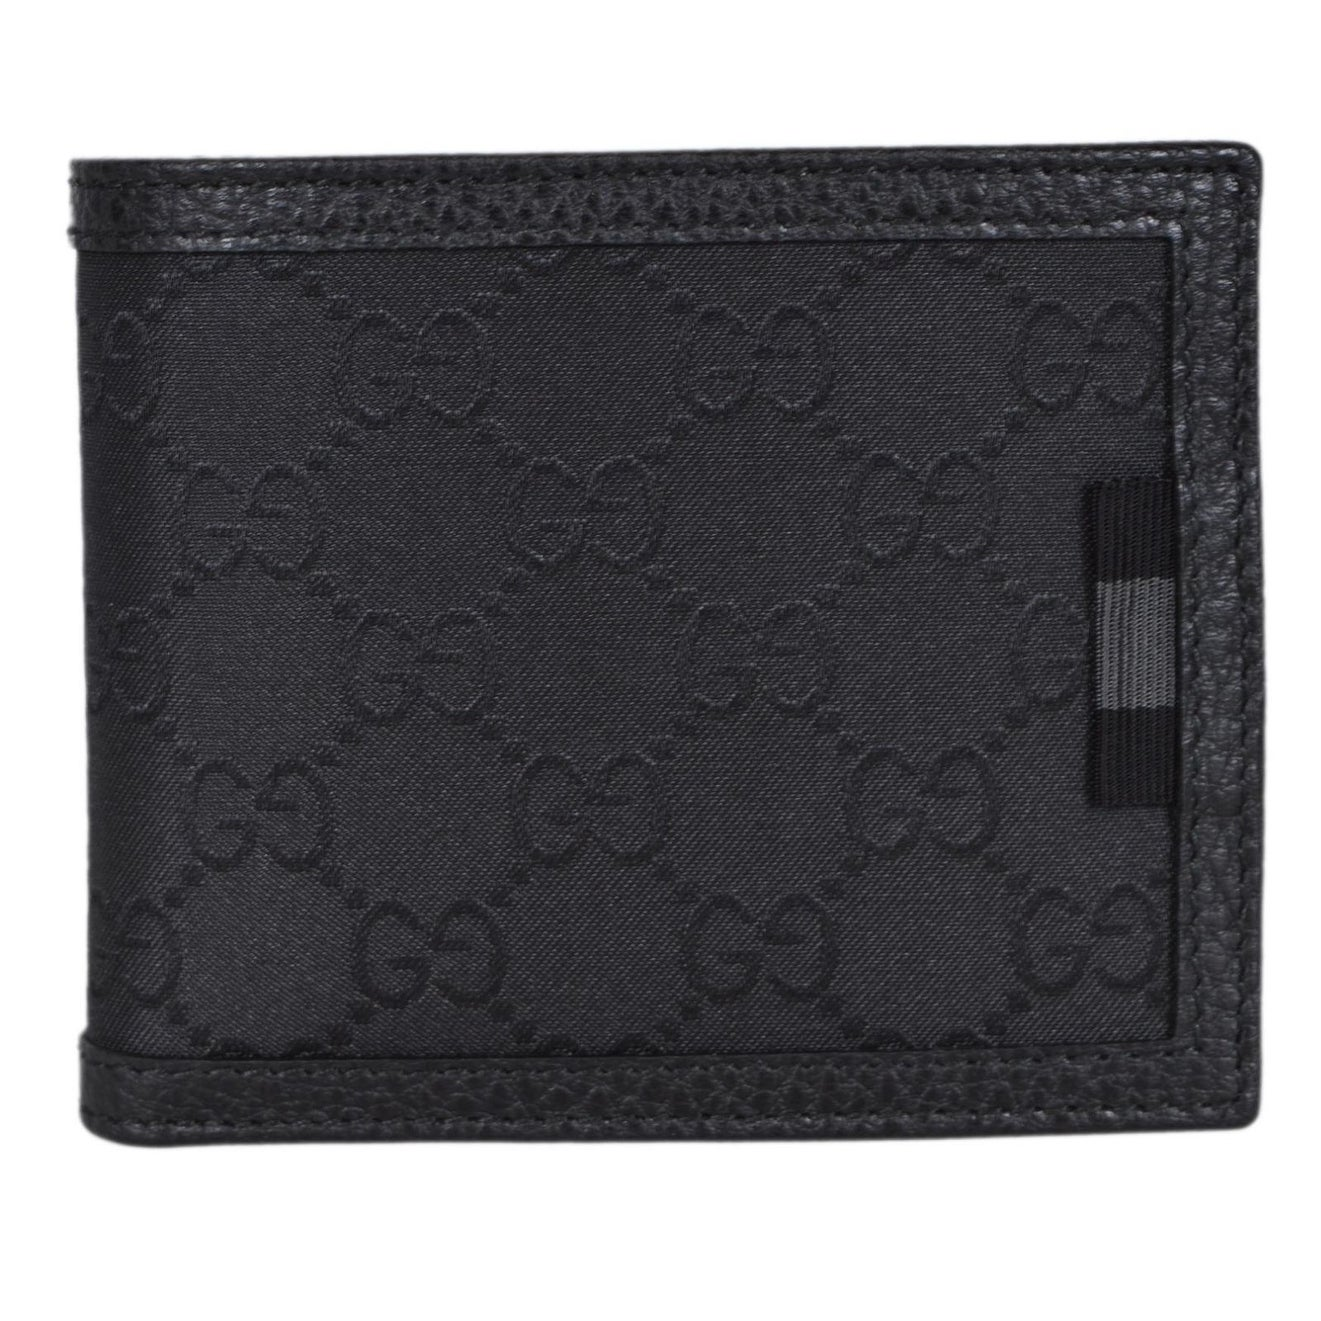 d9775b975e4f Buy Designer Wallets Online at Overstock | Our Best Designer Accessories  Deals